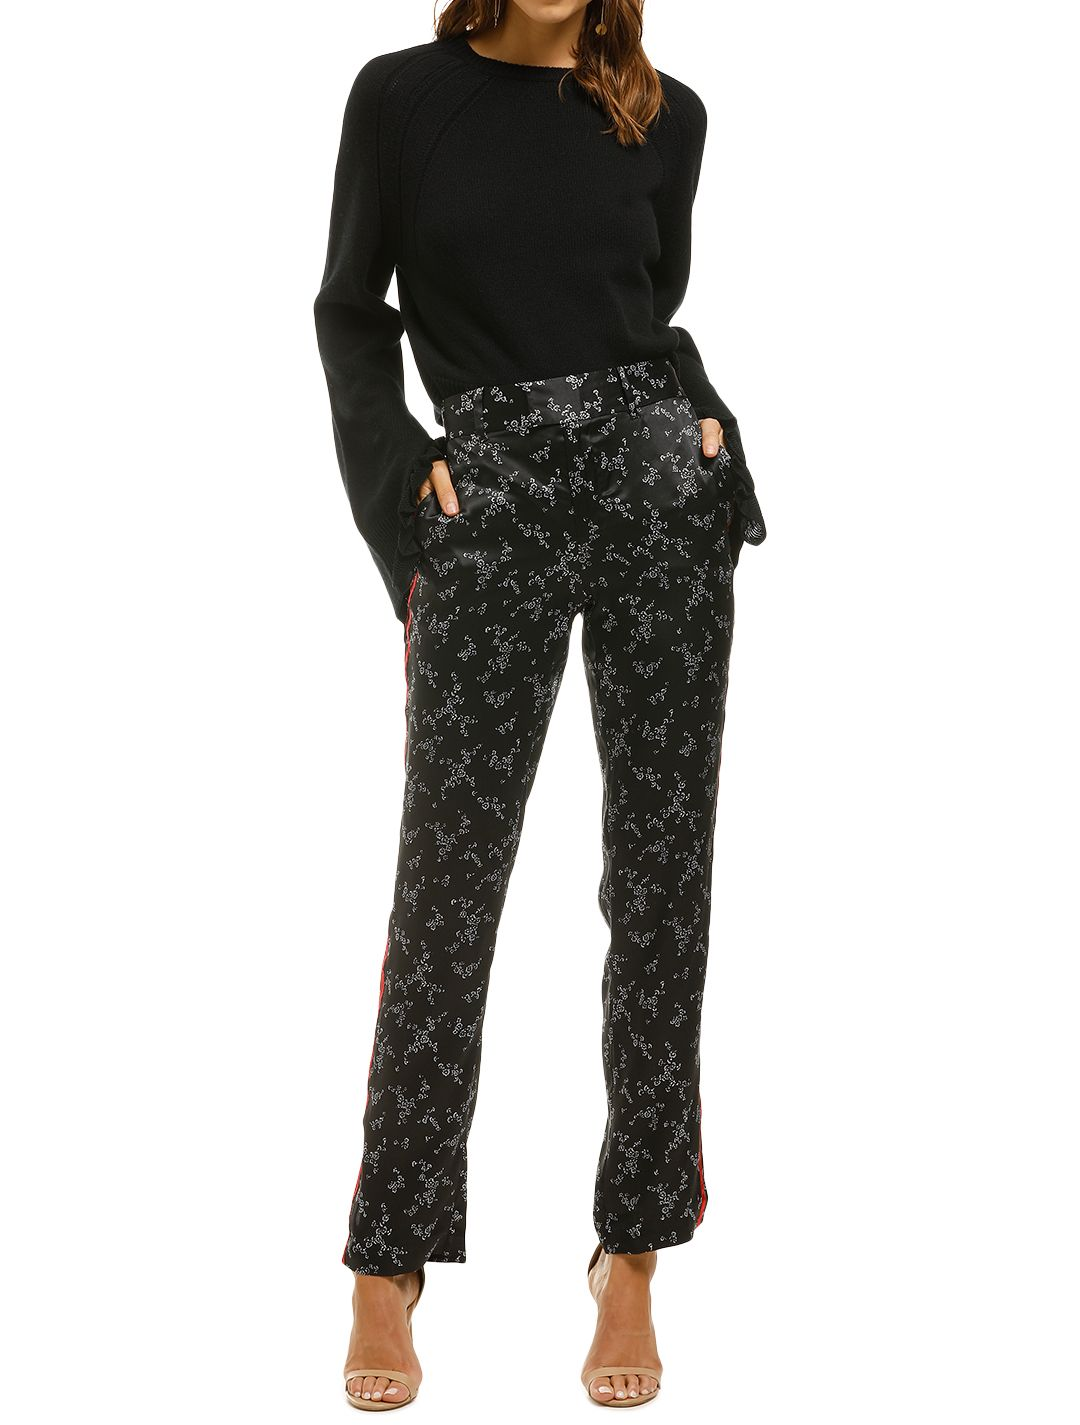 Equipment-Printed-Silk-Satin-Straight-Leg-Pant-Black-Floral-Front